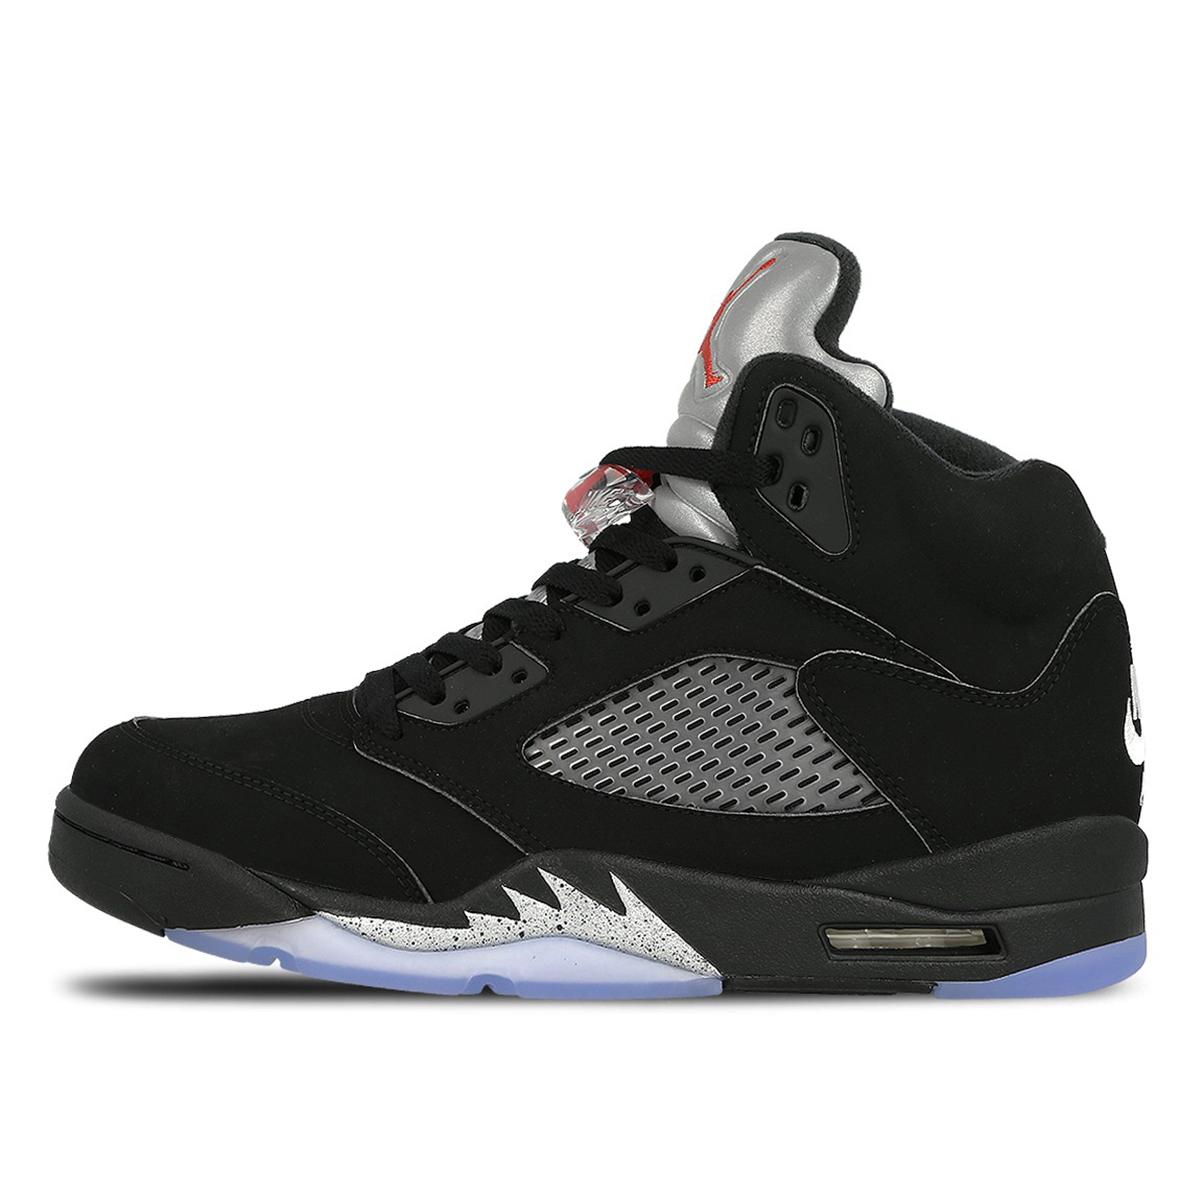 Air Jordan Nike AJ 5 V Retro Black Metallic (2016)